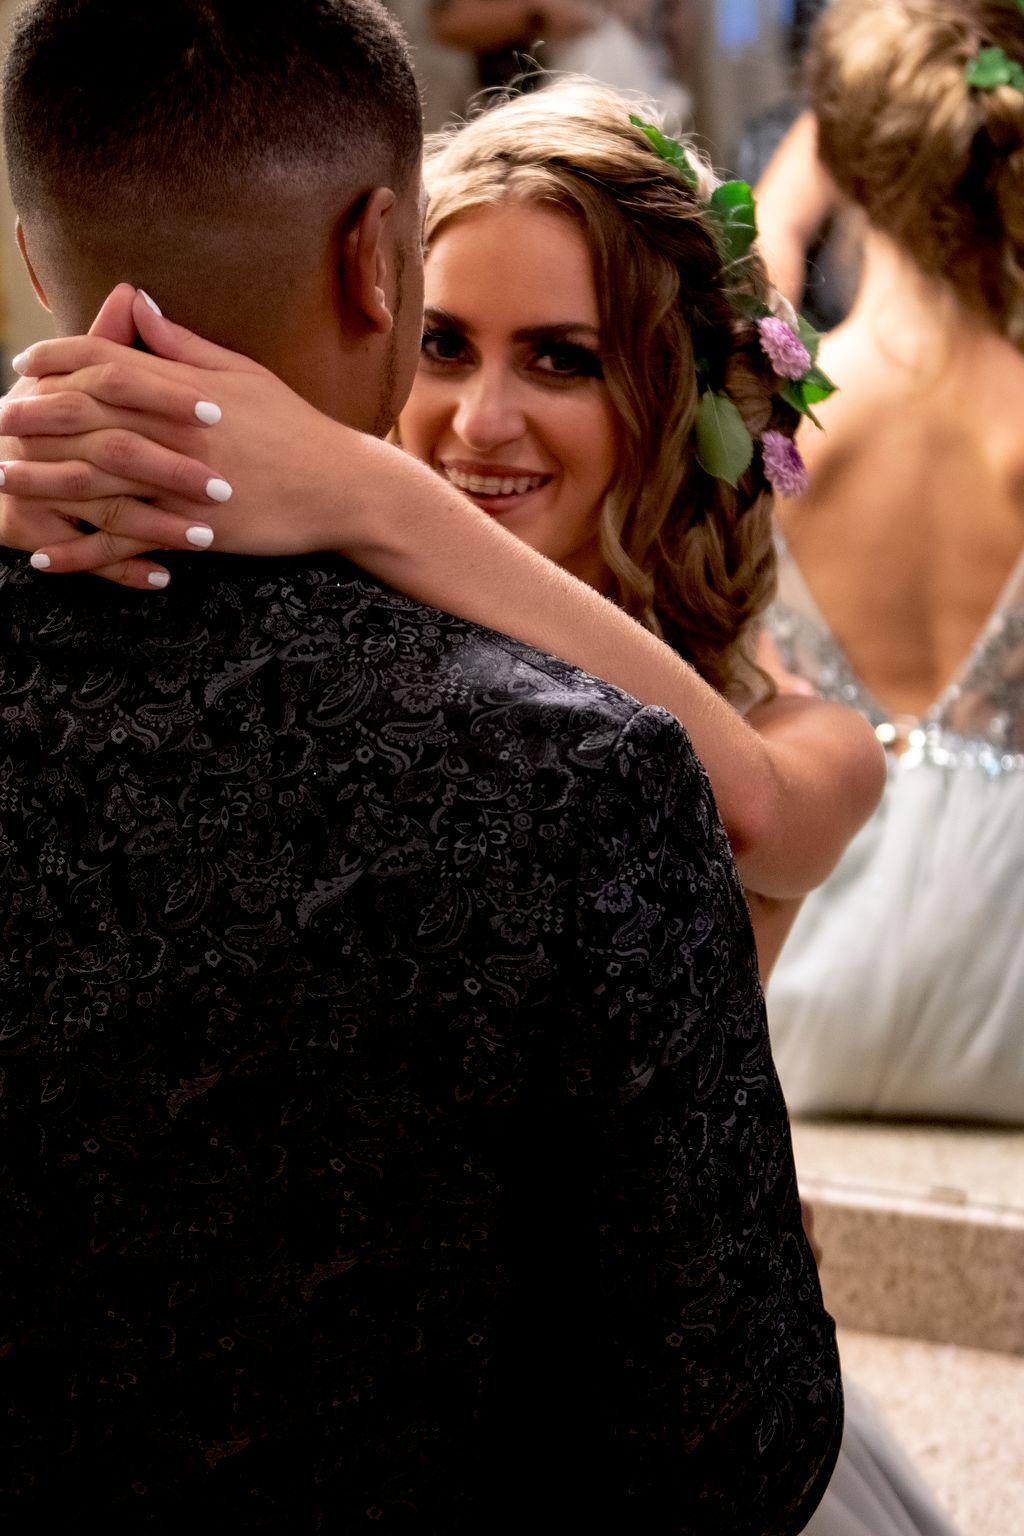 Bride and groom photos